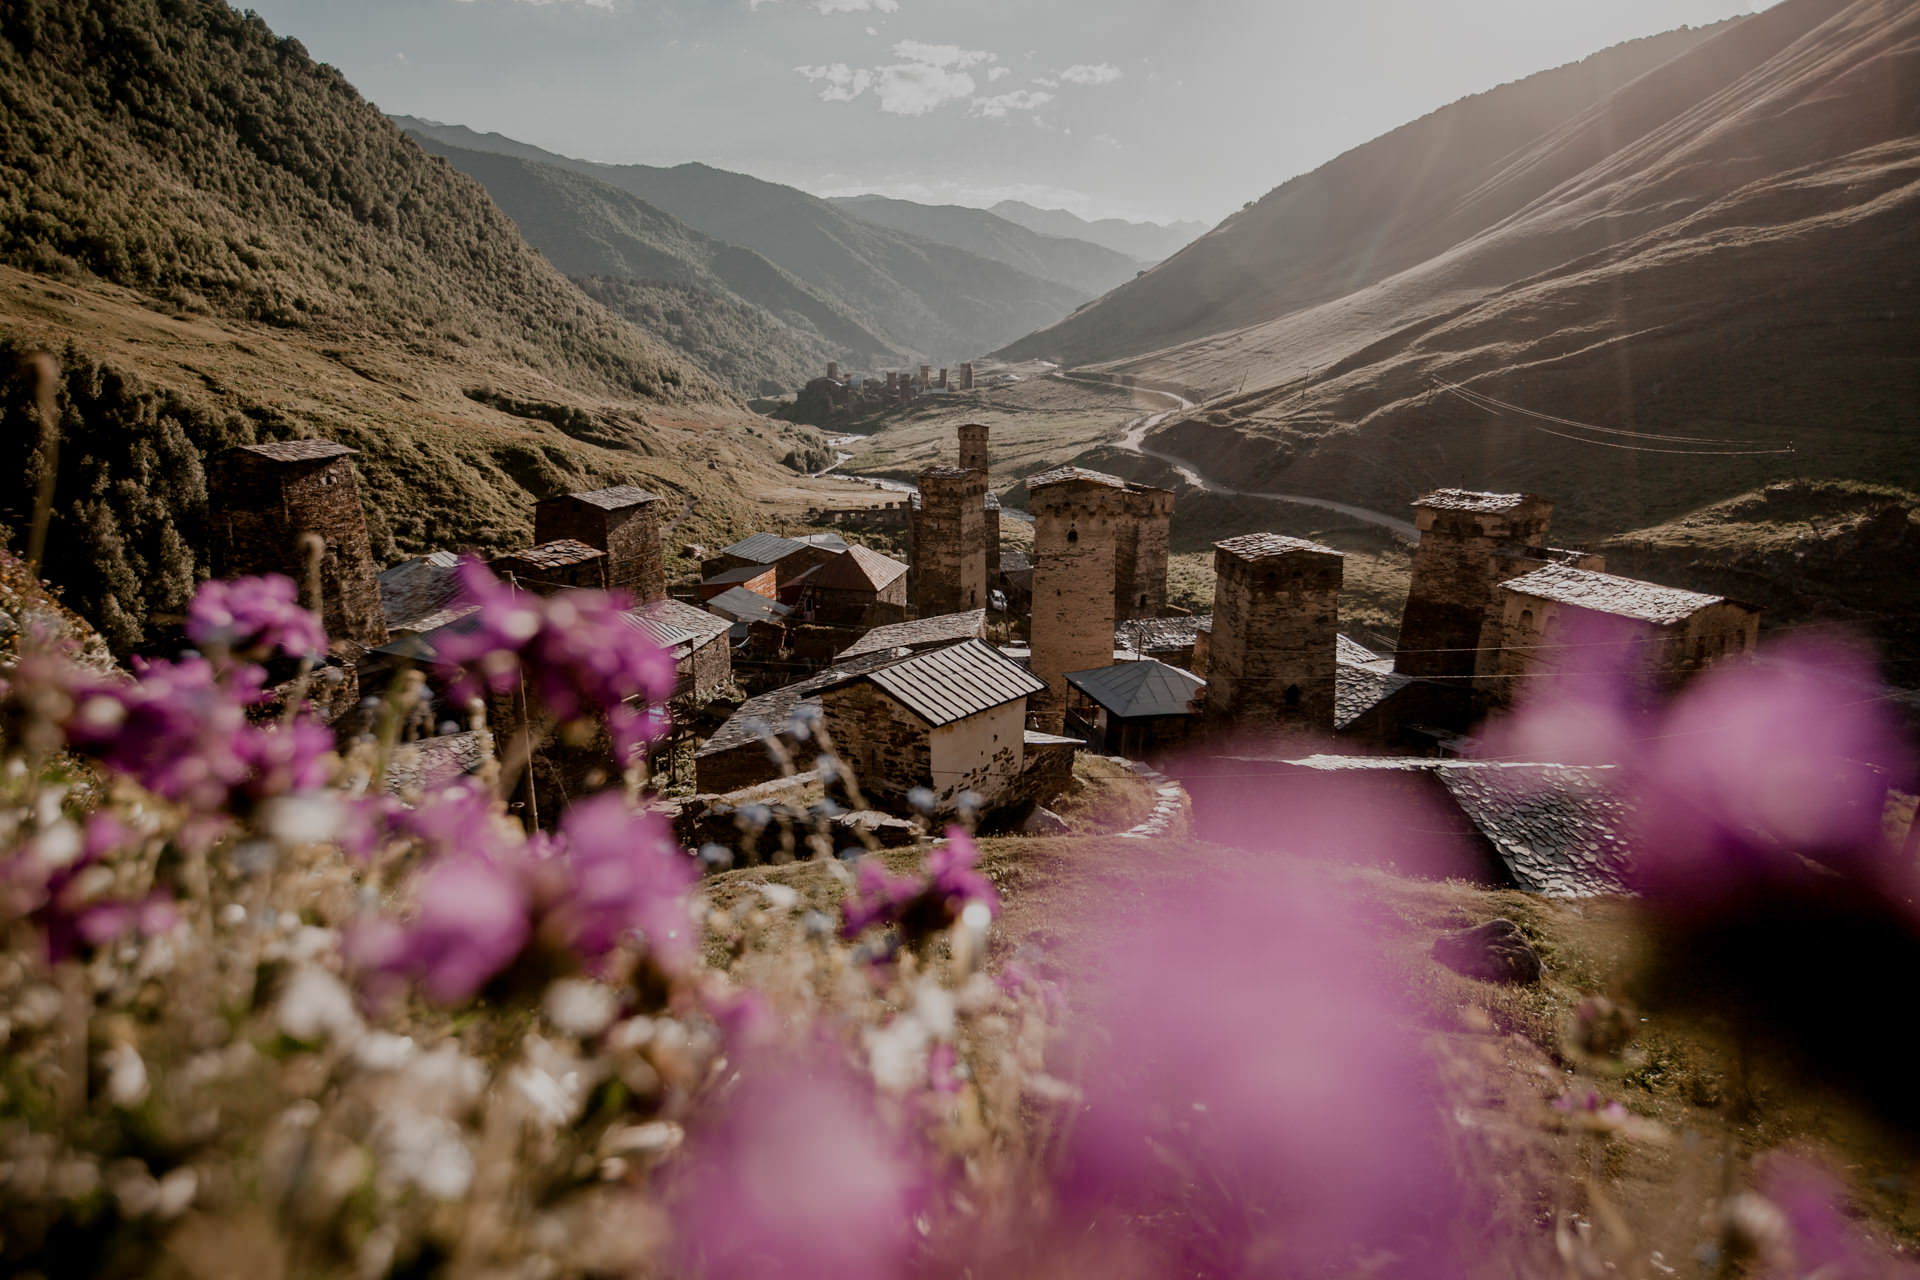 Uszguli - Swanetia